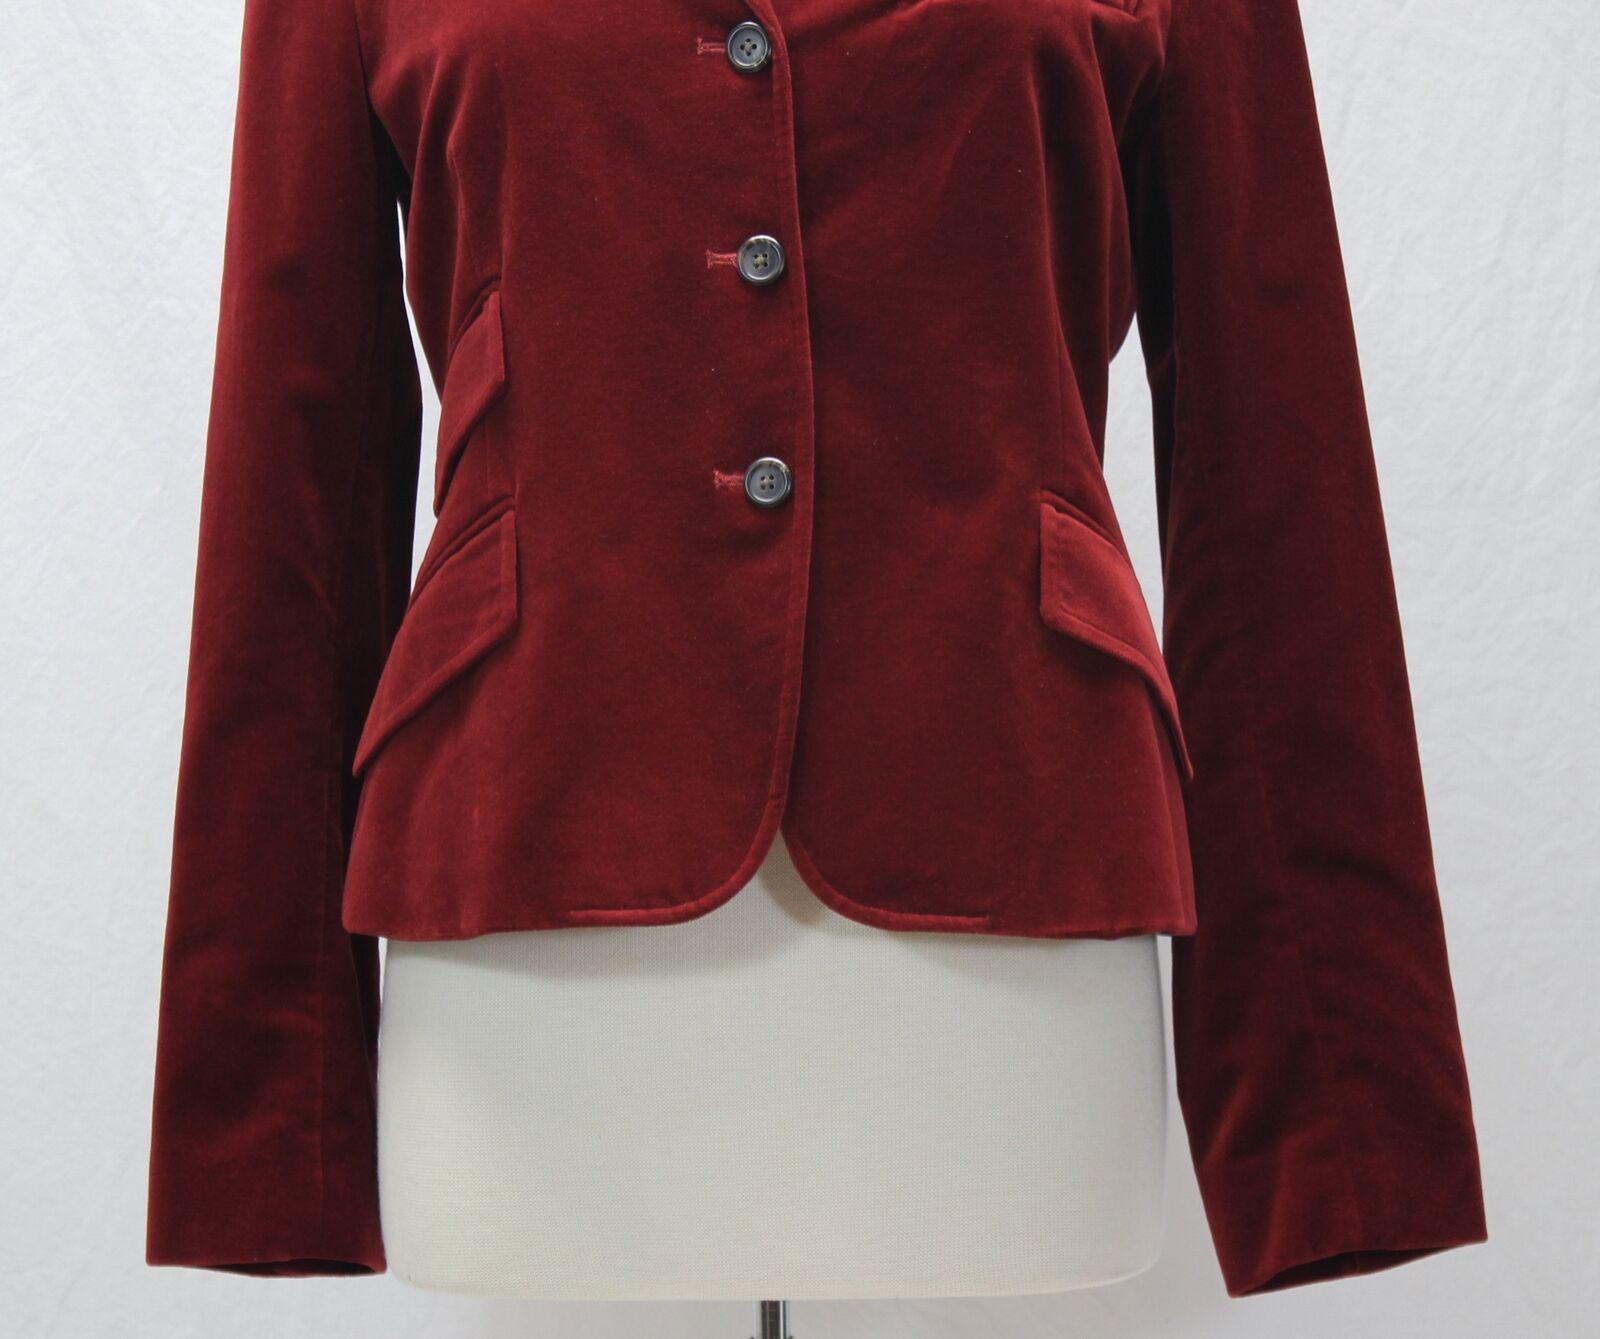 Ralph Lauren Red Velvet Blazer Jacket Size 10 - image 3